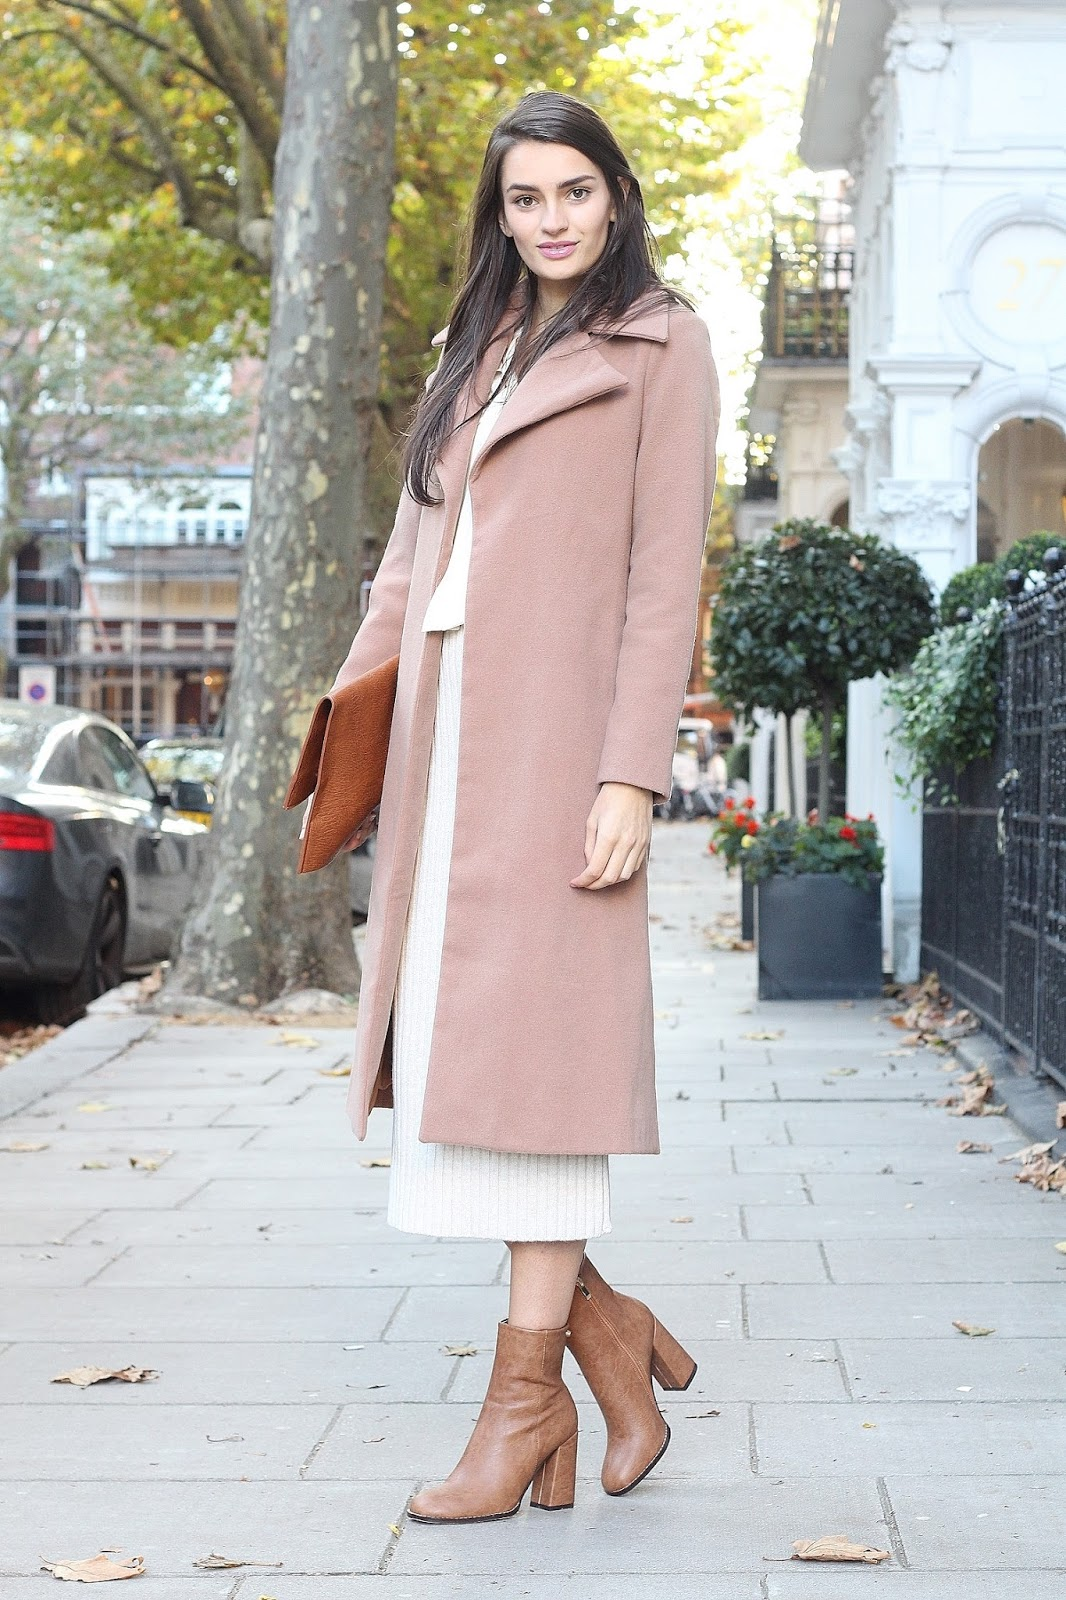 peexo fashion blogger layering autumn neutrals